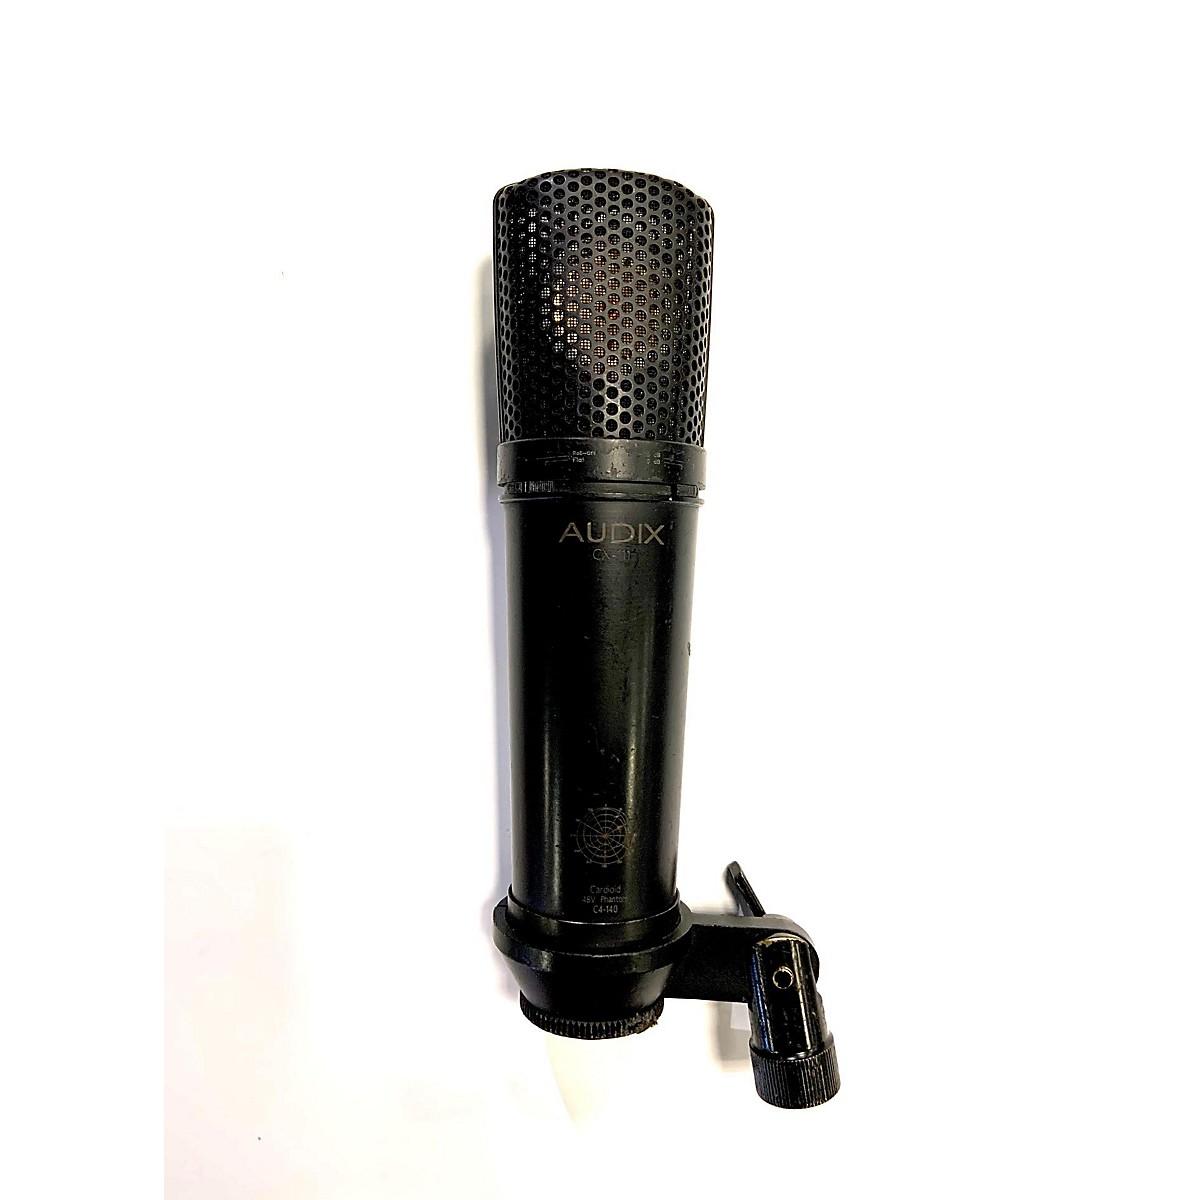 Audix CX-111 Condenser Microphone